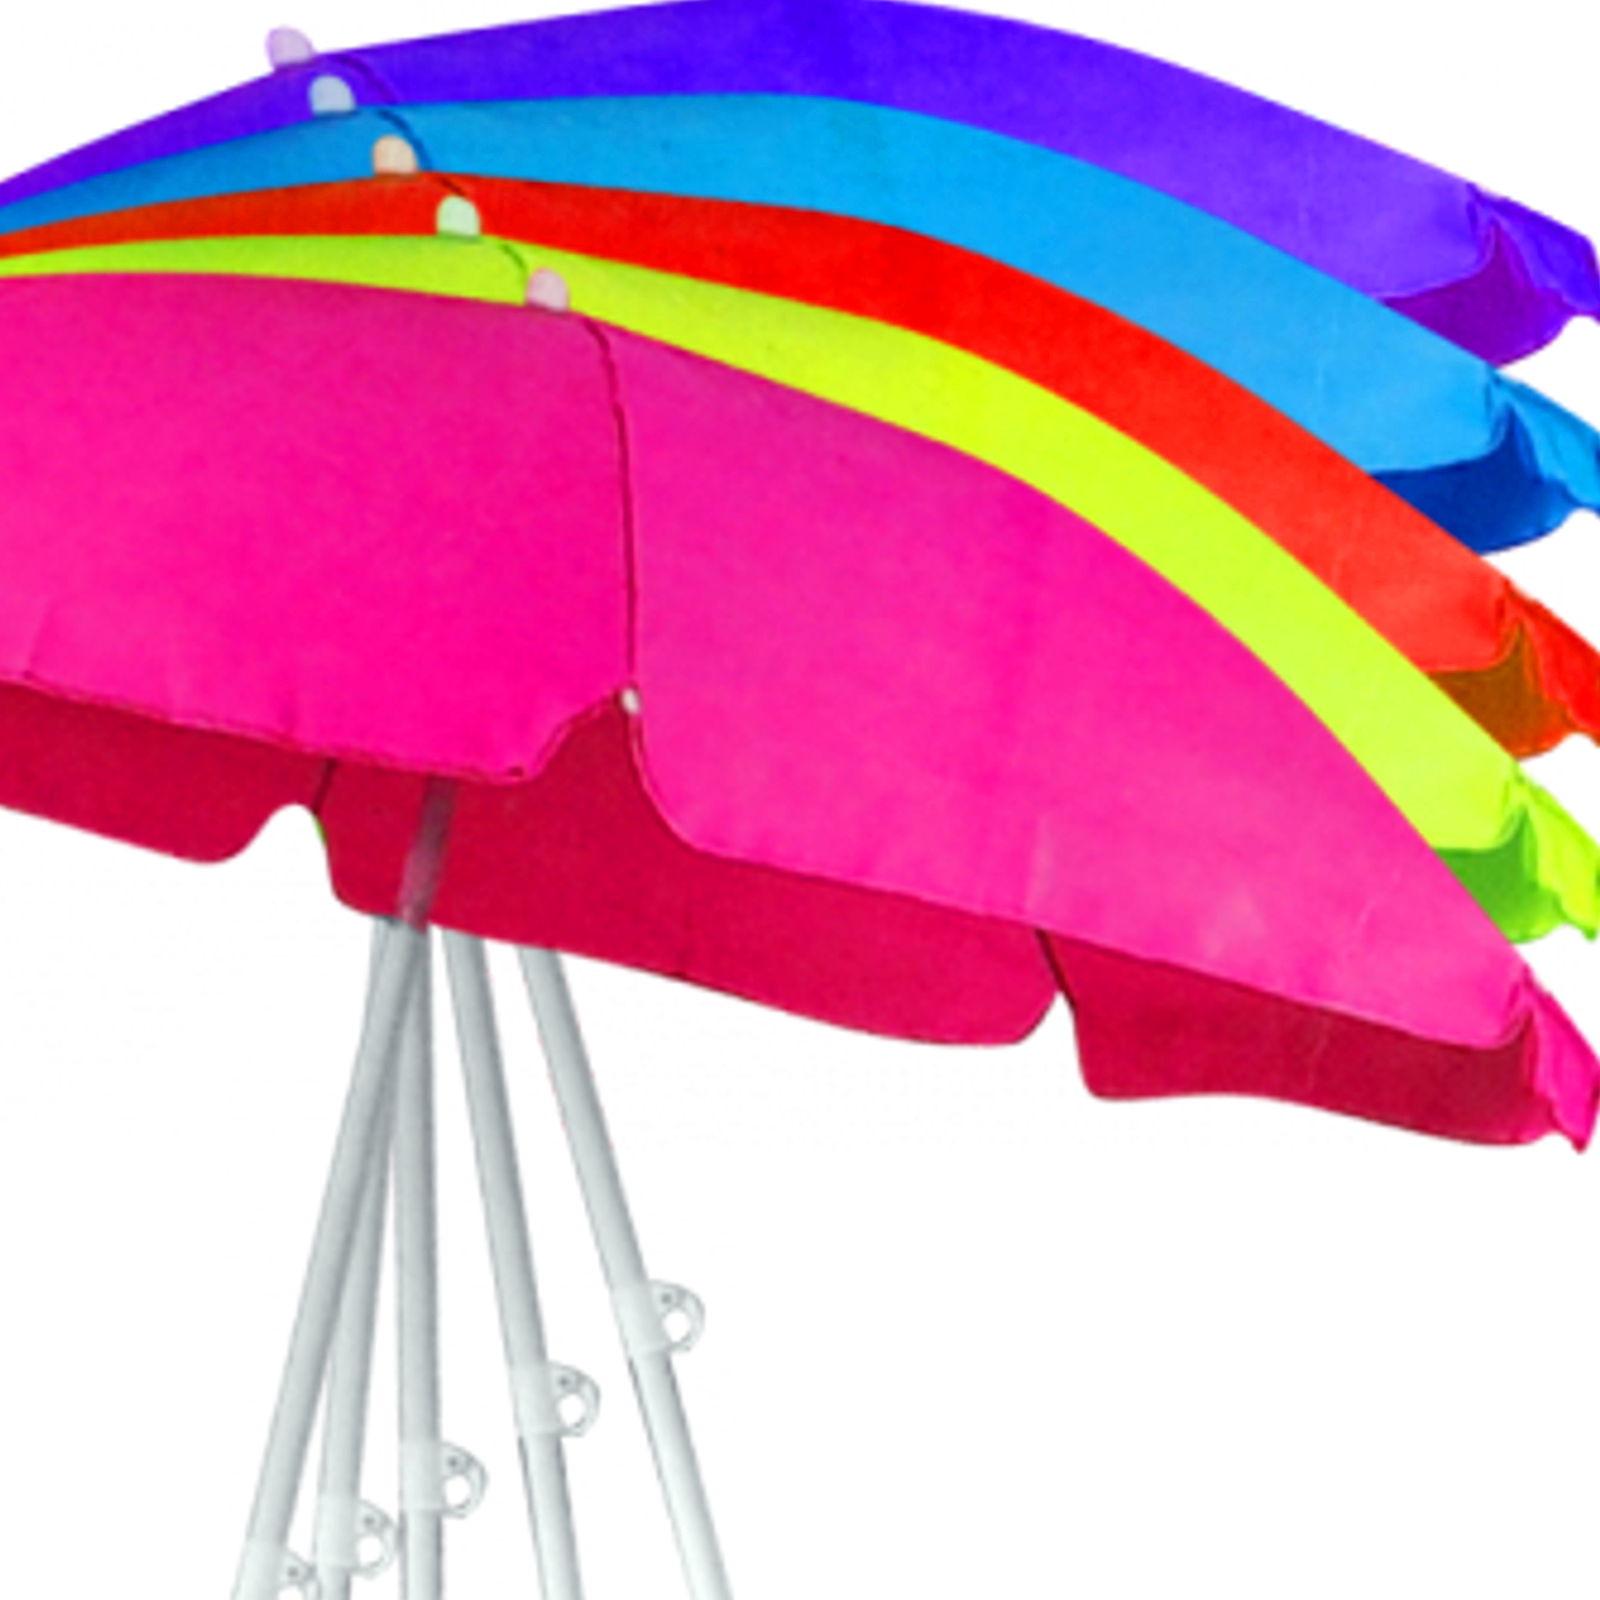 150 cm 160 cm sonnenschirm strandschirm schirm gartenschirm 5 farben ebay. Black Bedroom Furniture Sets. Home Design Ideas